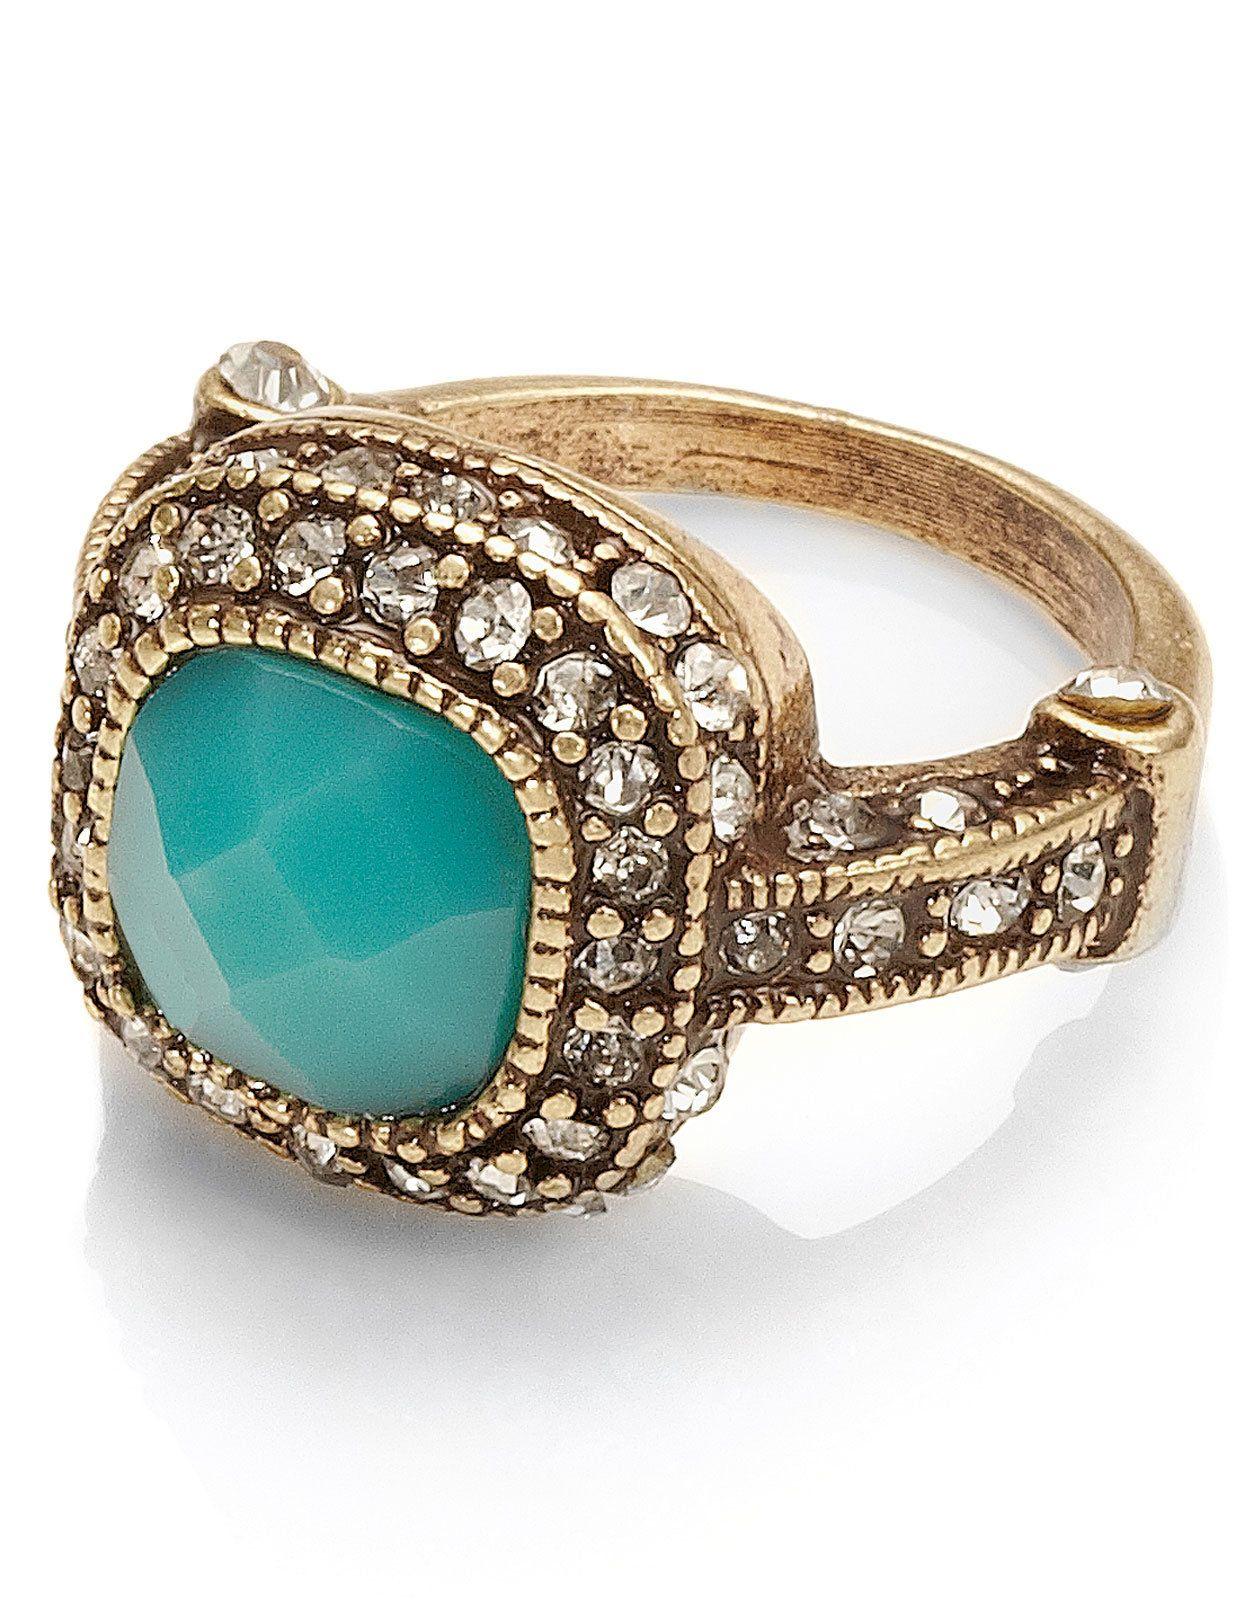 Wedding rings jewelry ringsfashion ringluxury ringswedding